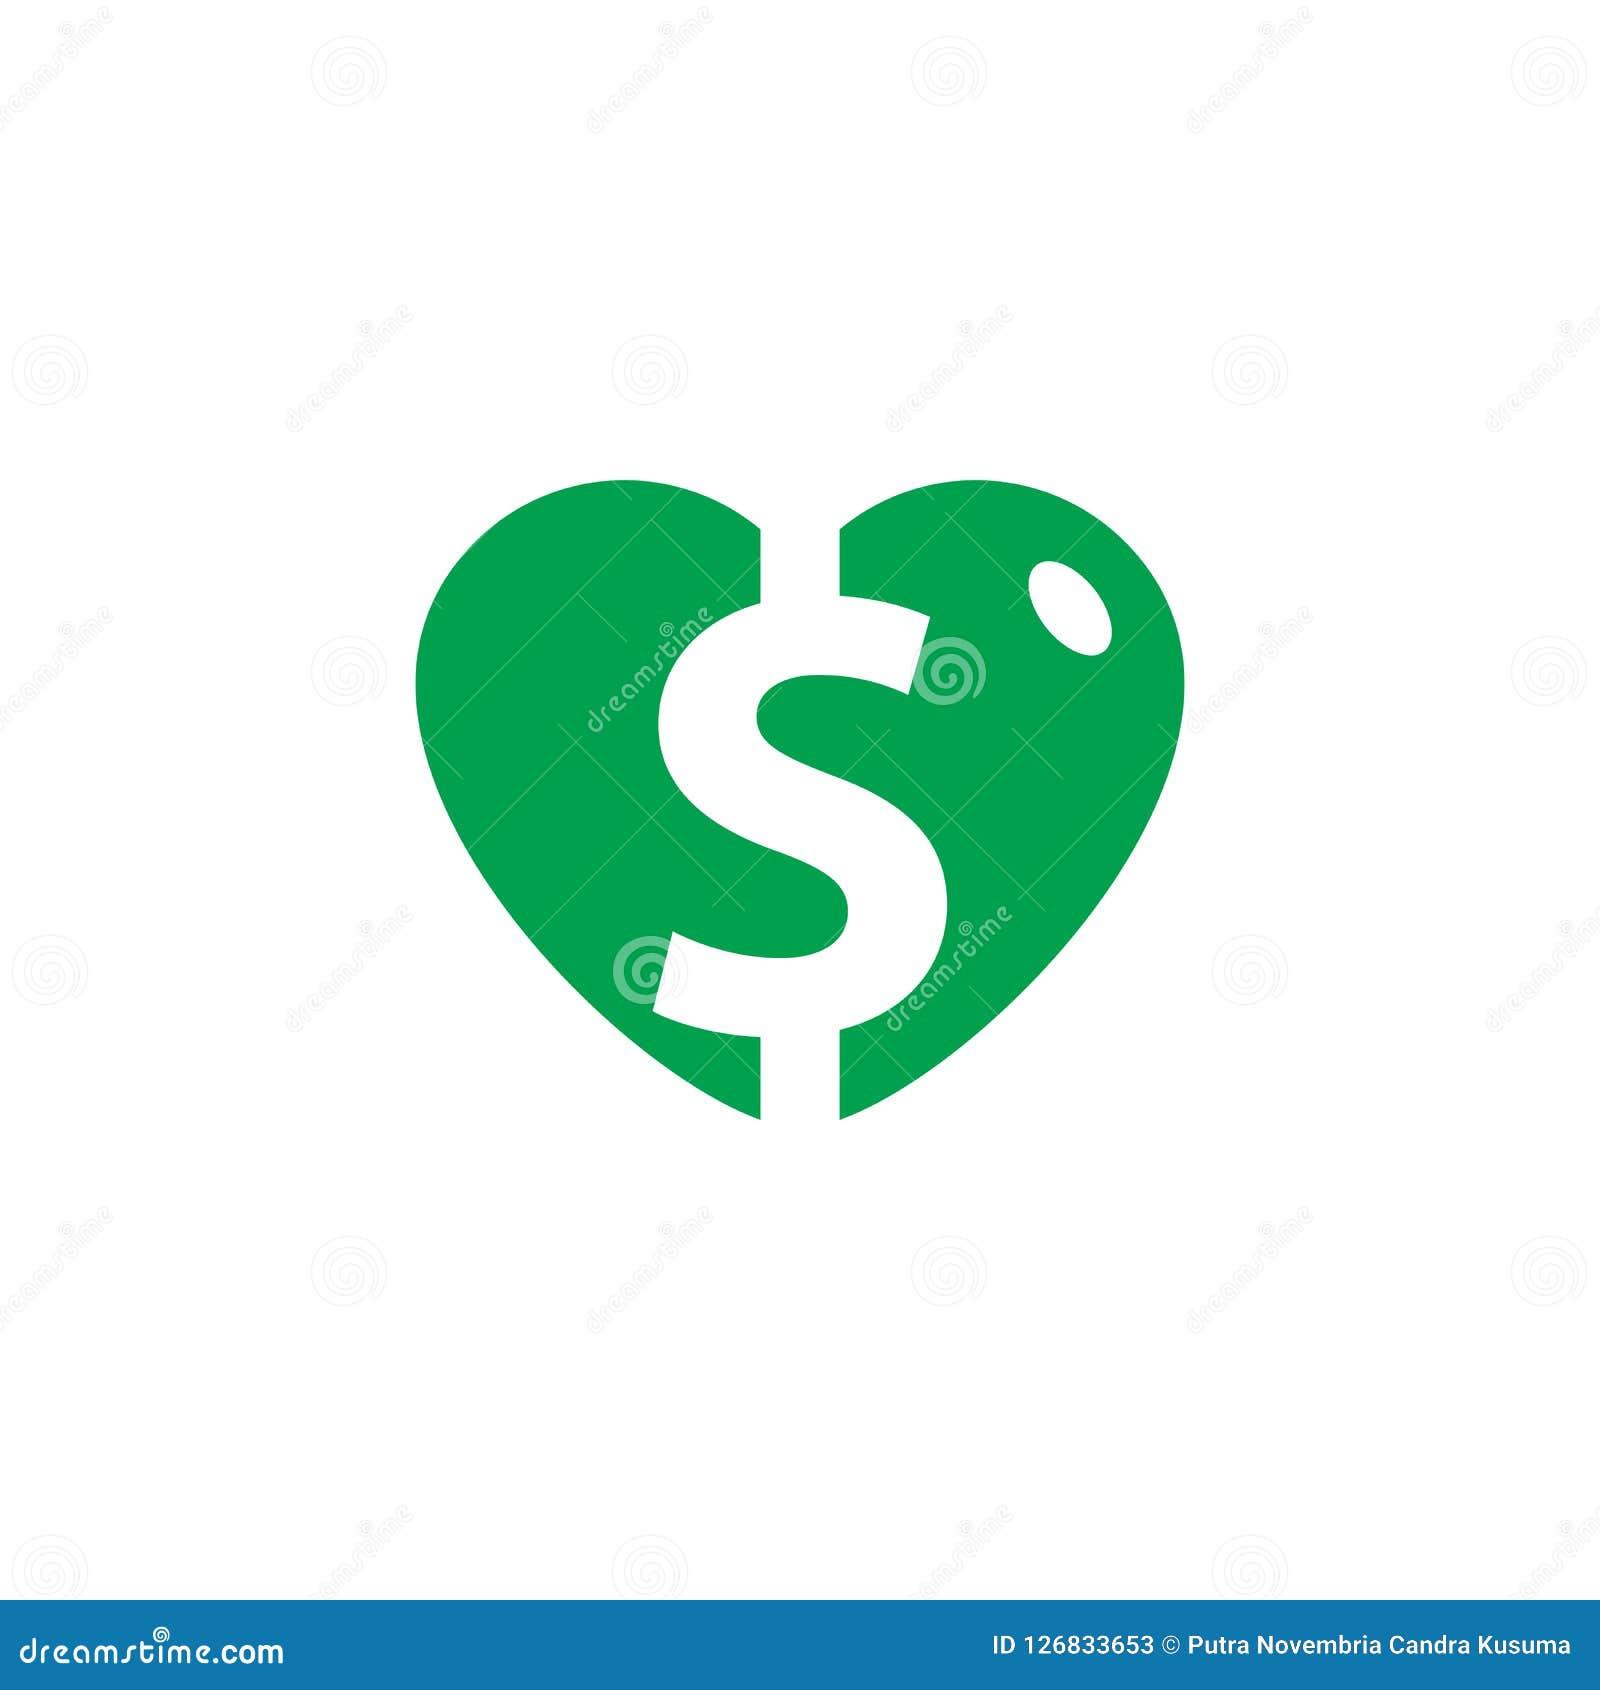 love money logo icon design stock illustration illustration of